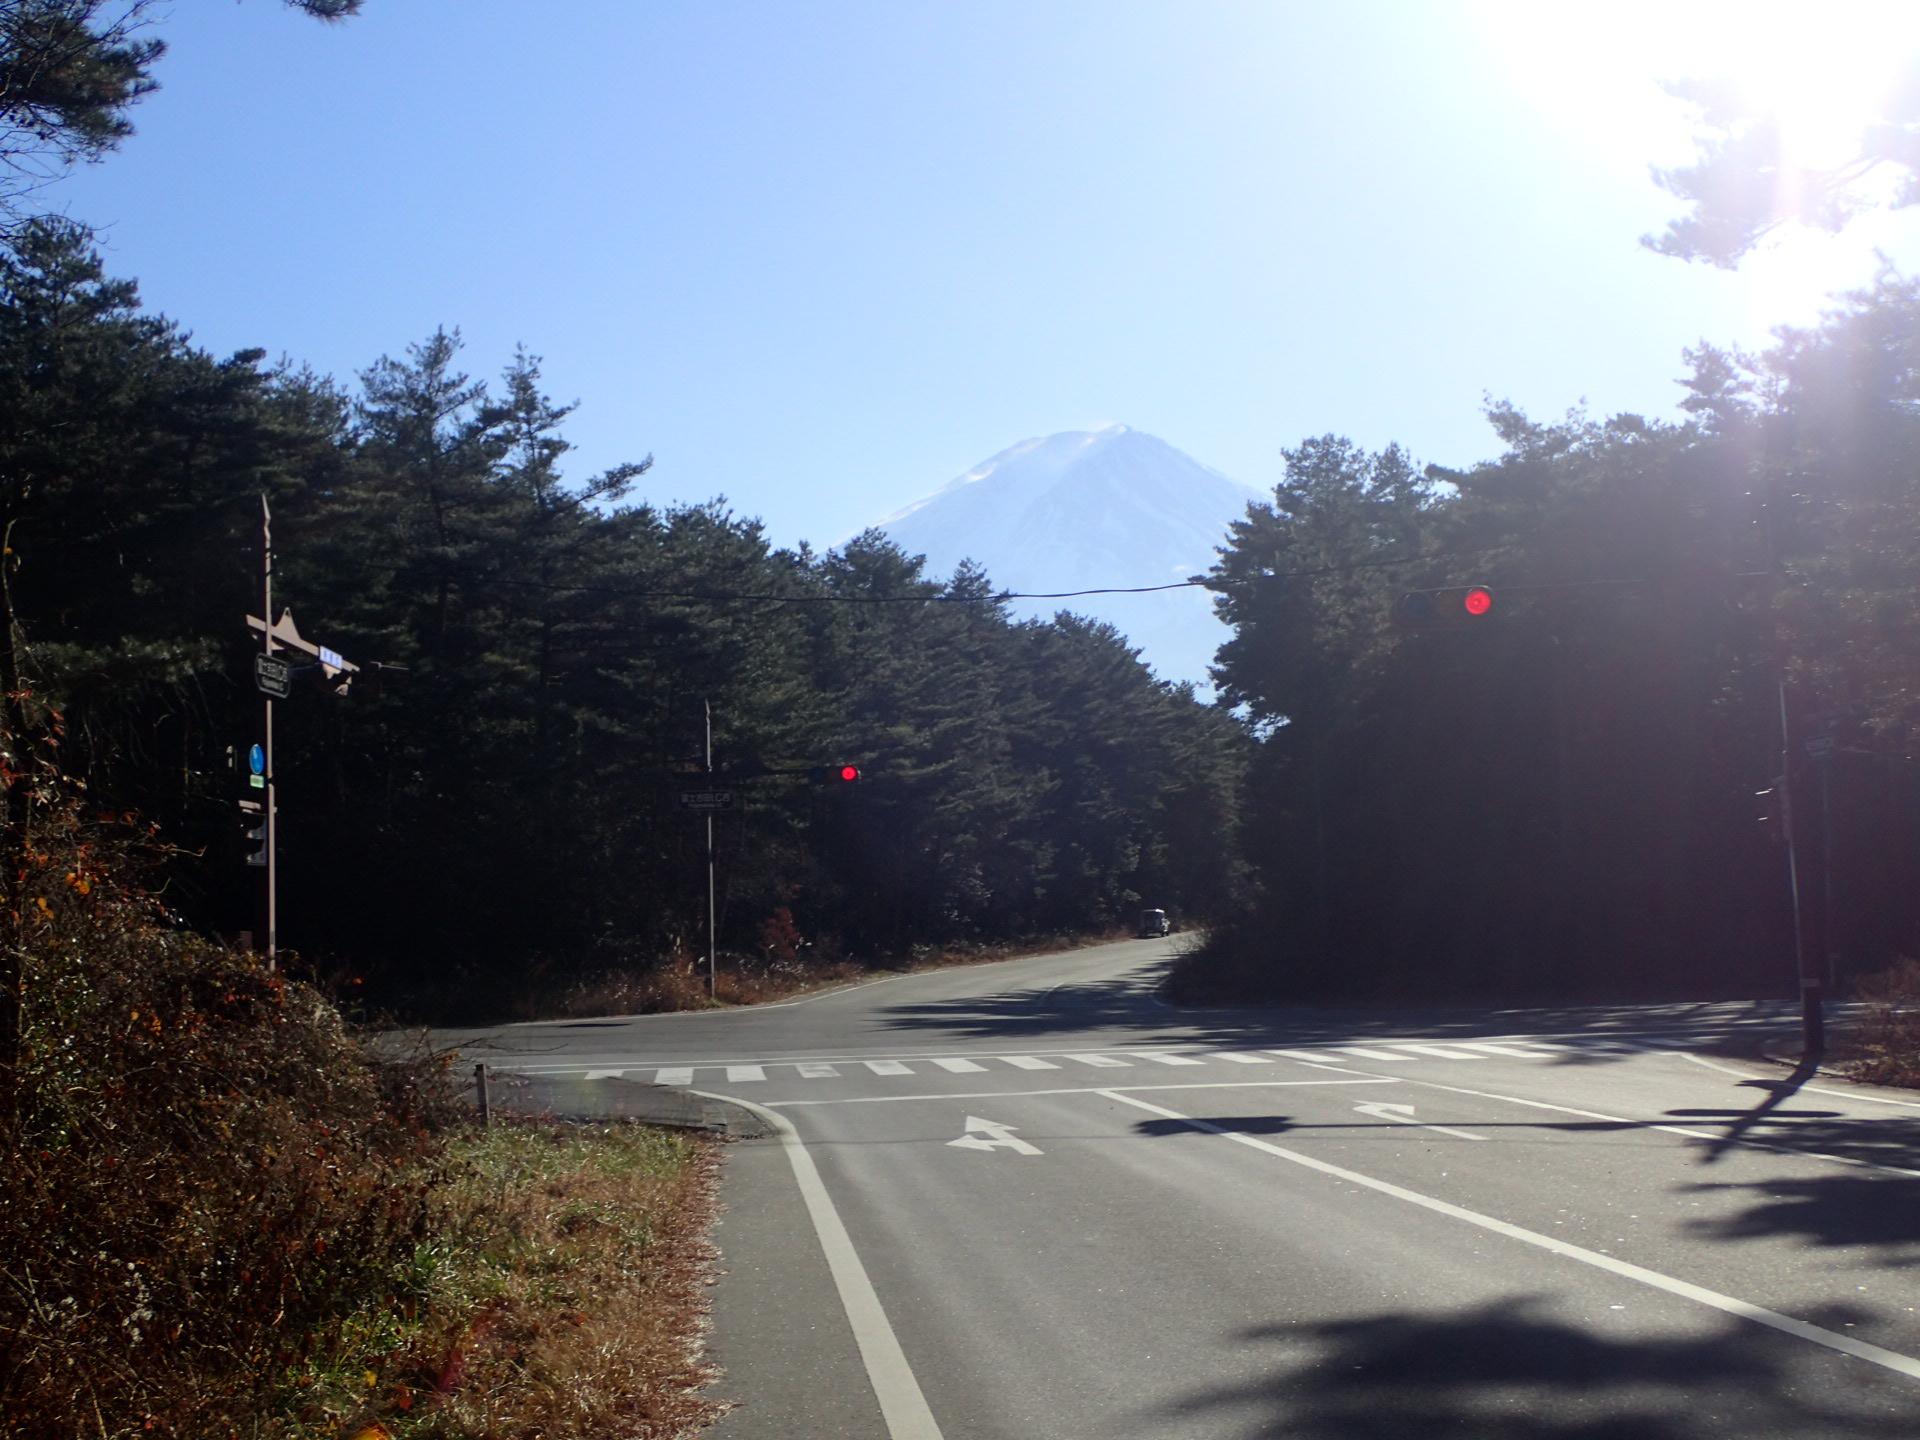 http://www.yamanashi-kankou.jp/blog/3%E5%89%A3%E4%B8%B8%E5%B0%BE.jpg